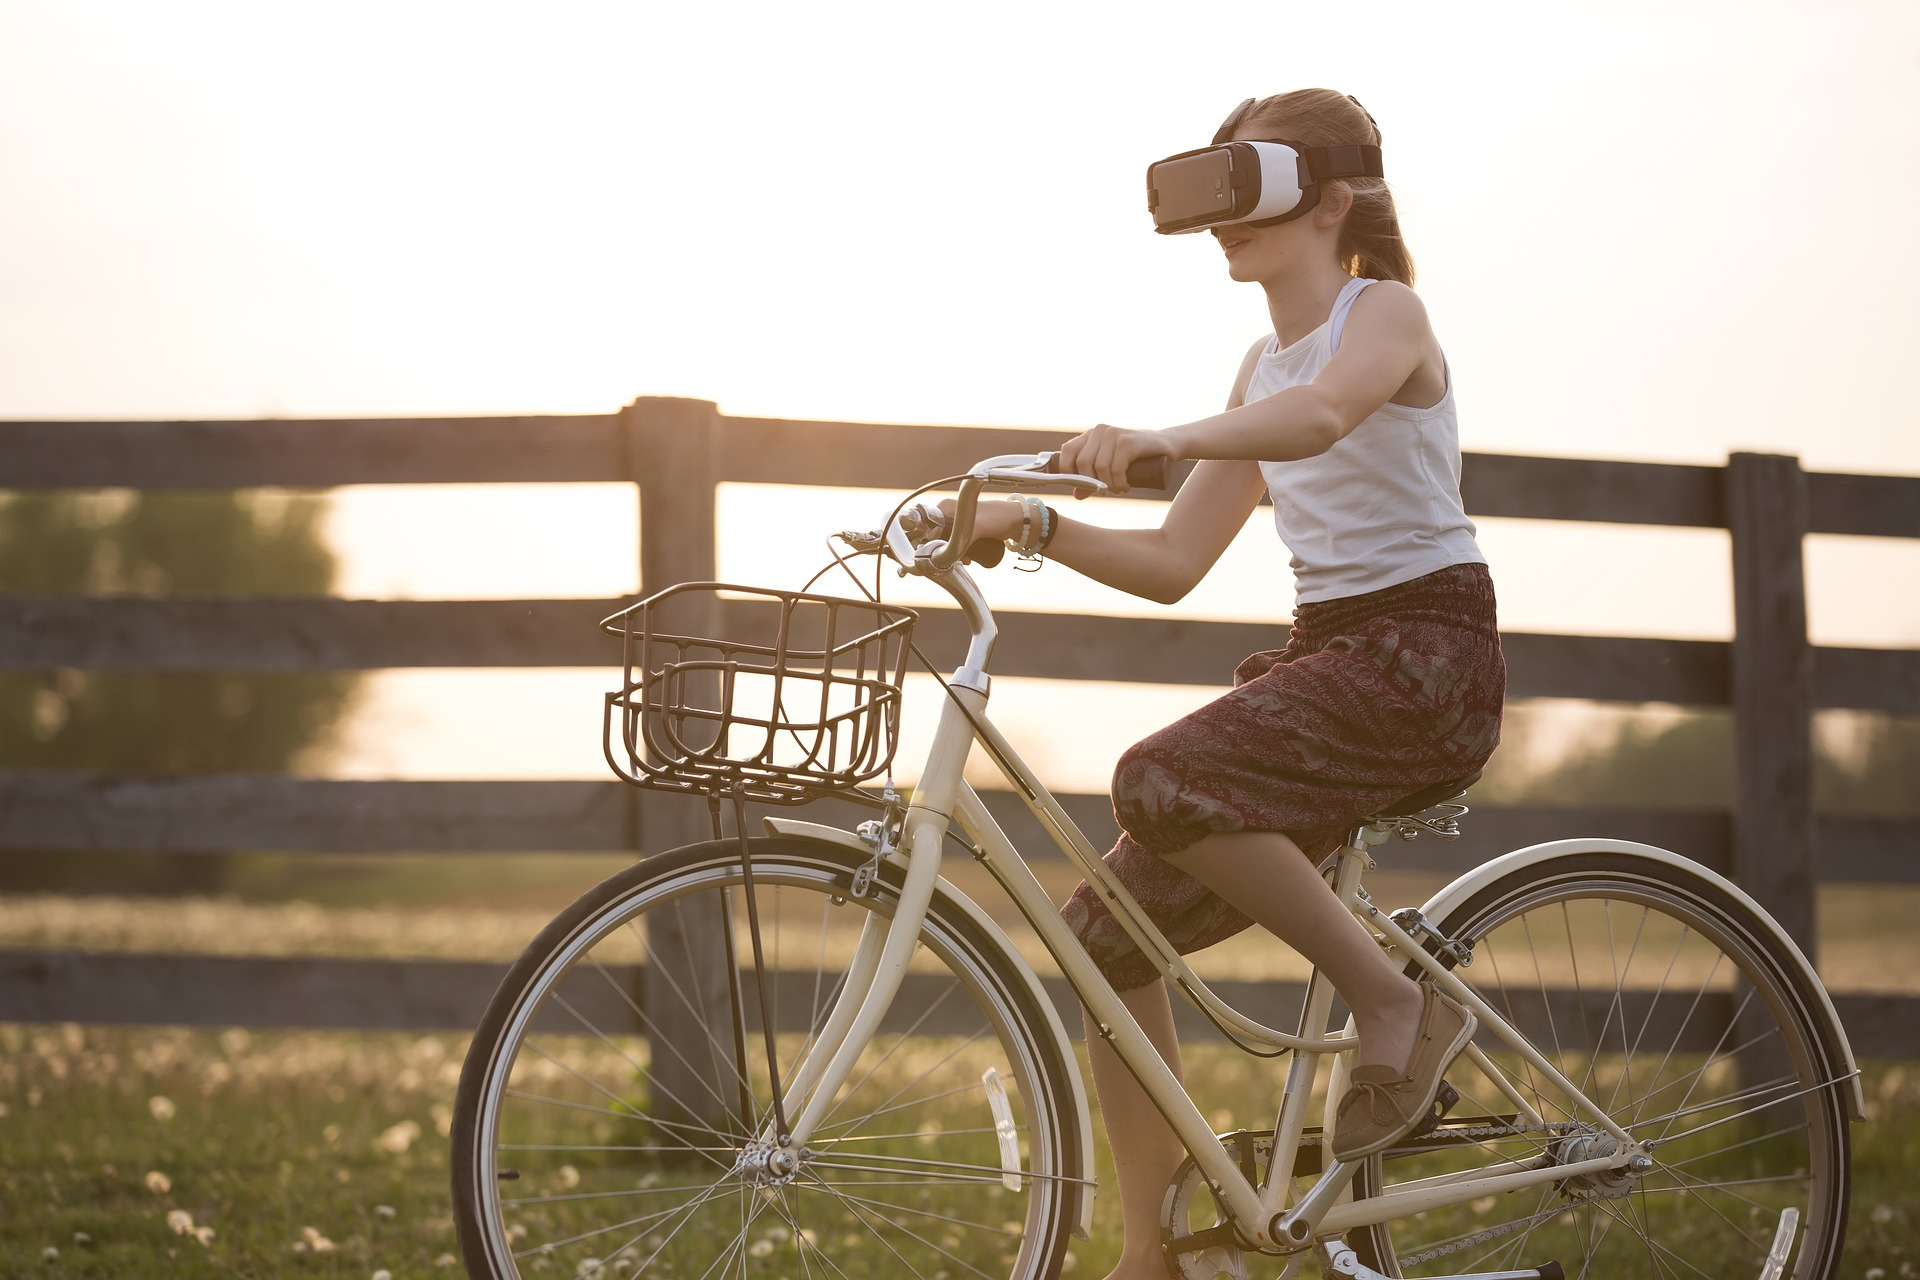 Realidade virtual: O que eu preciso saber sobre essa novidade?